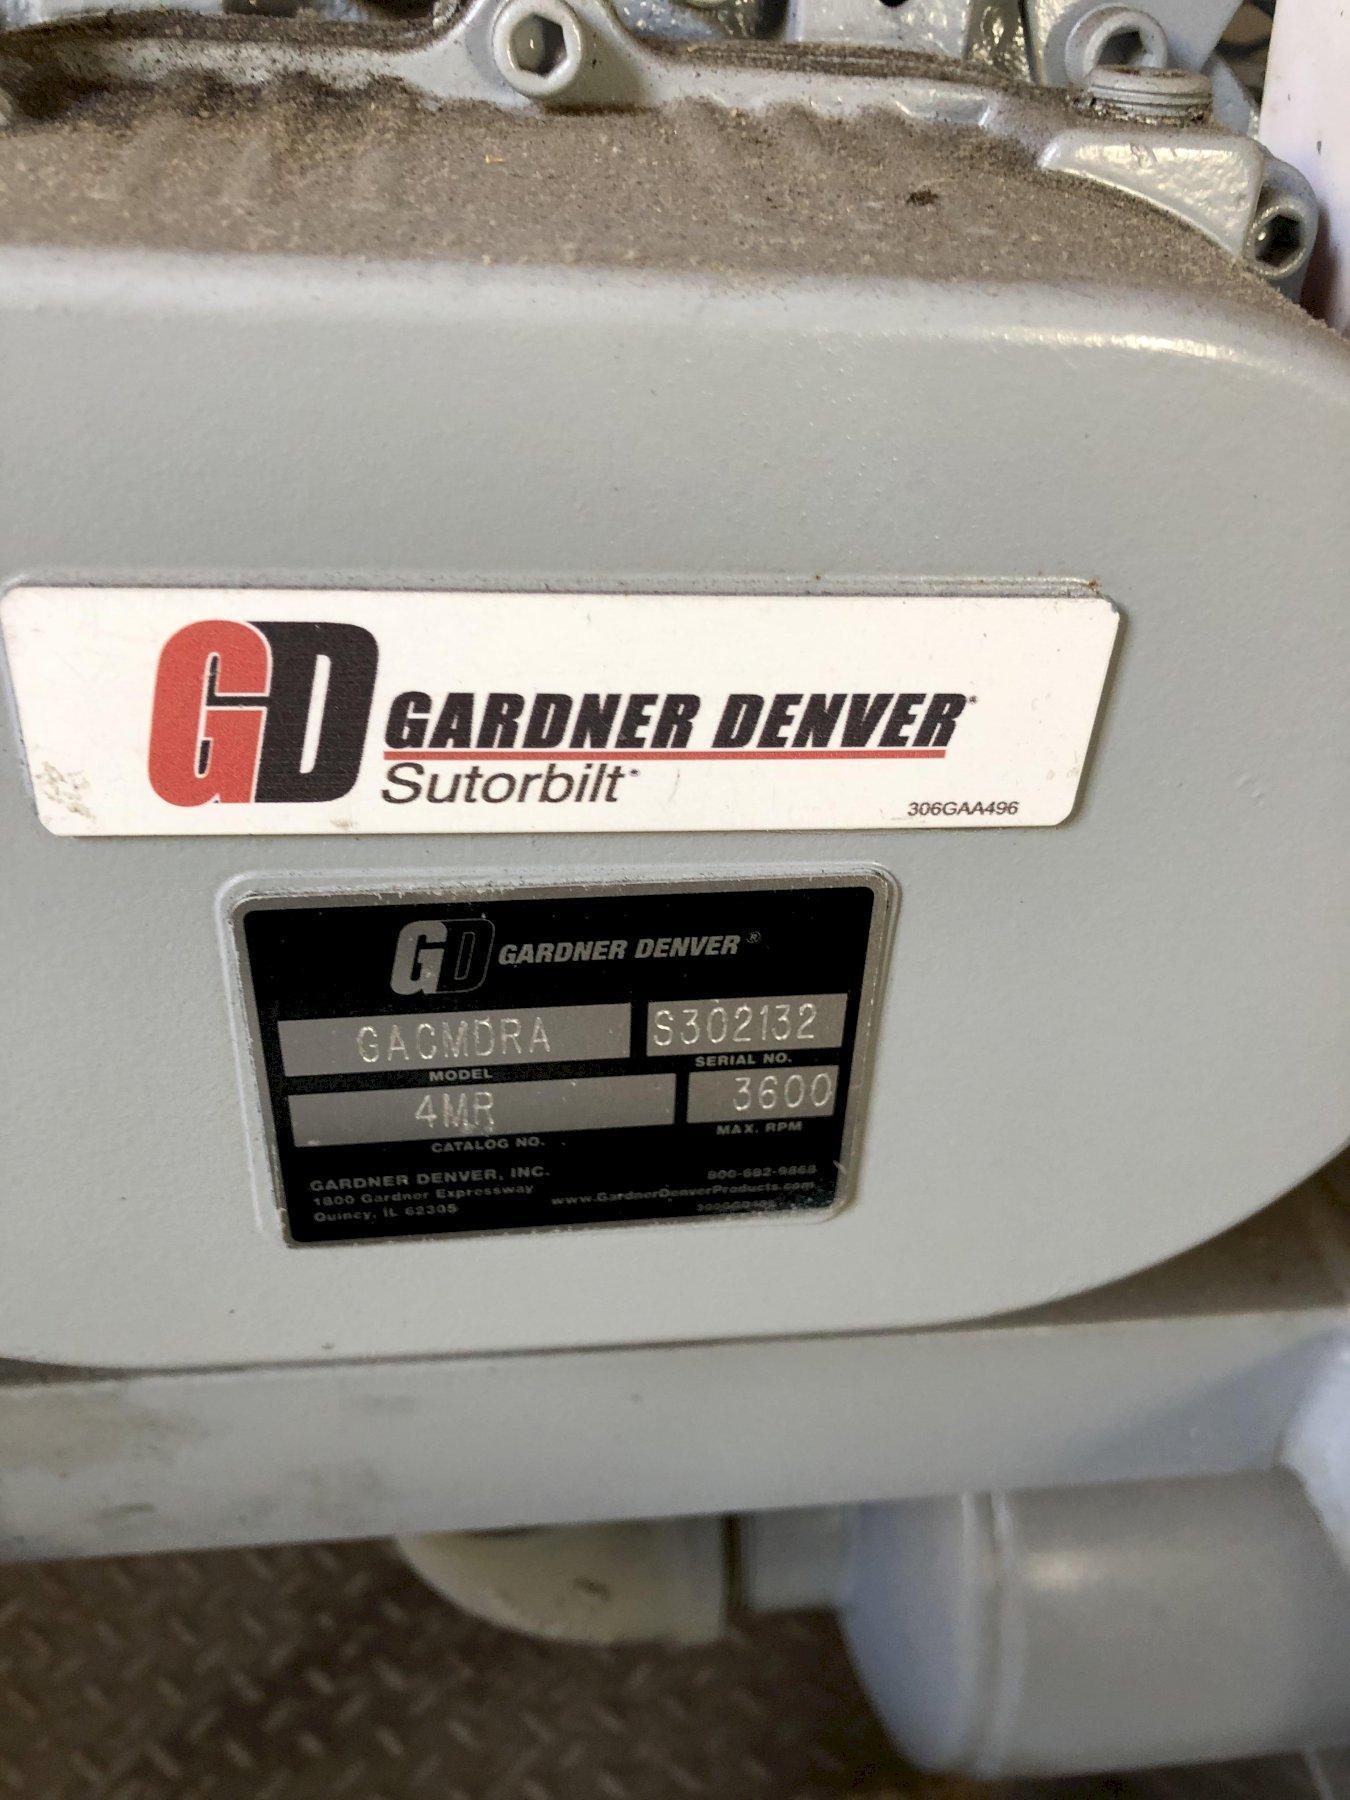 2009 Gardner Denver Sutorbilt model gacmdra blower s/n s302132 with 20 hp motor